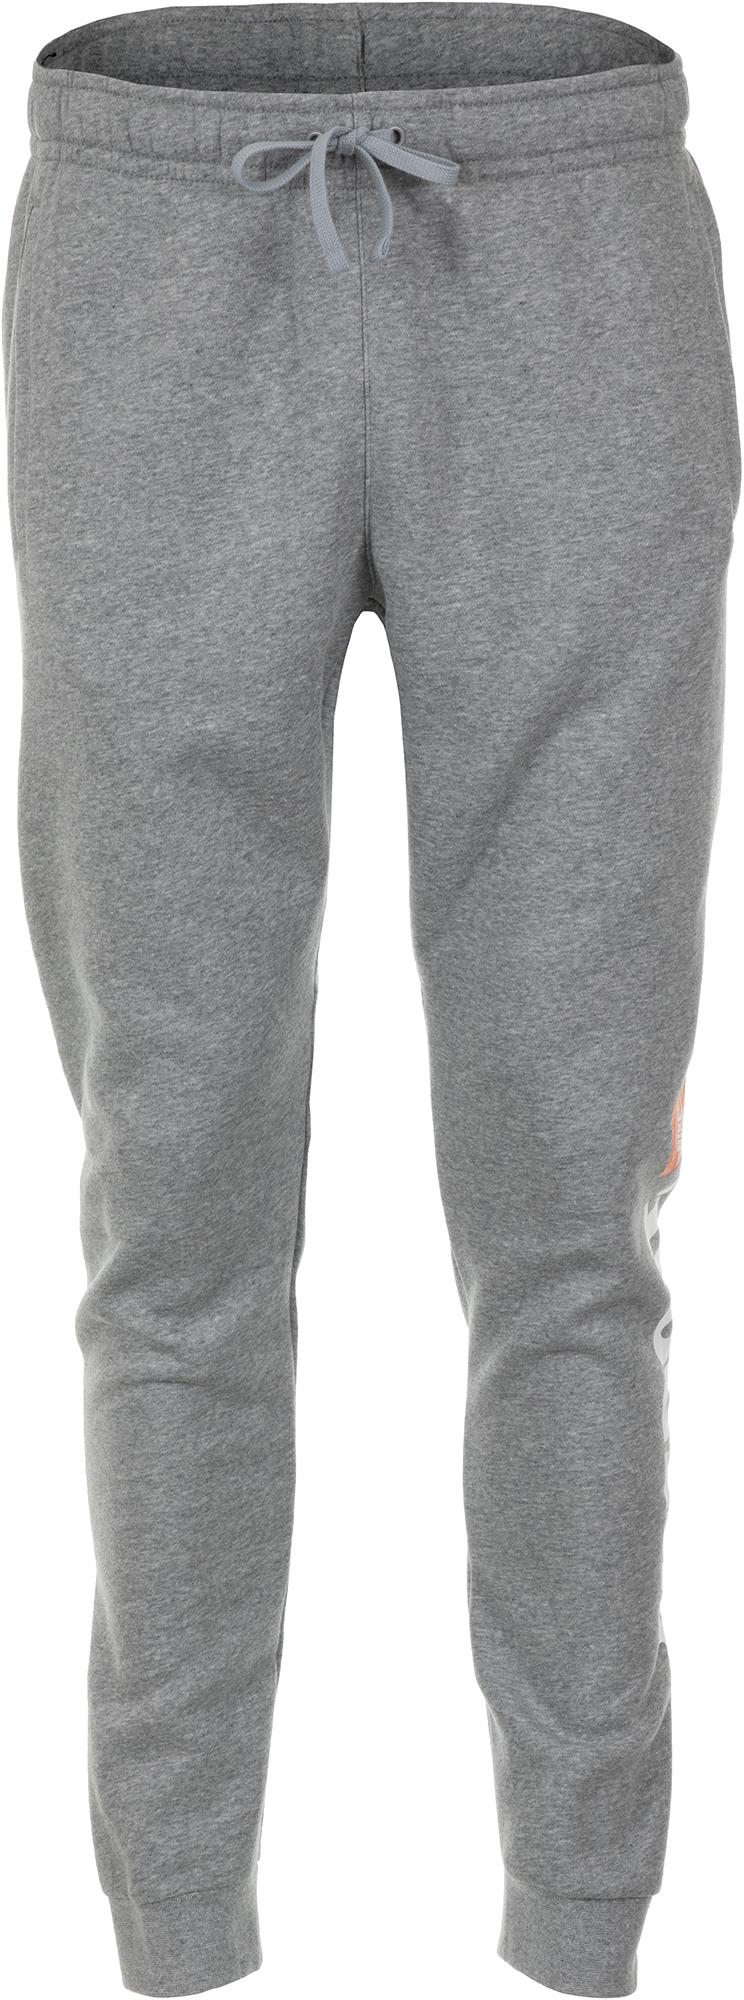 Nike Брюки мужские Nike Sportswear, размер 52-54 стоимость